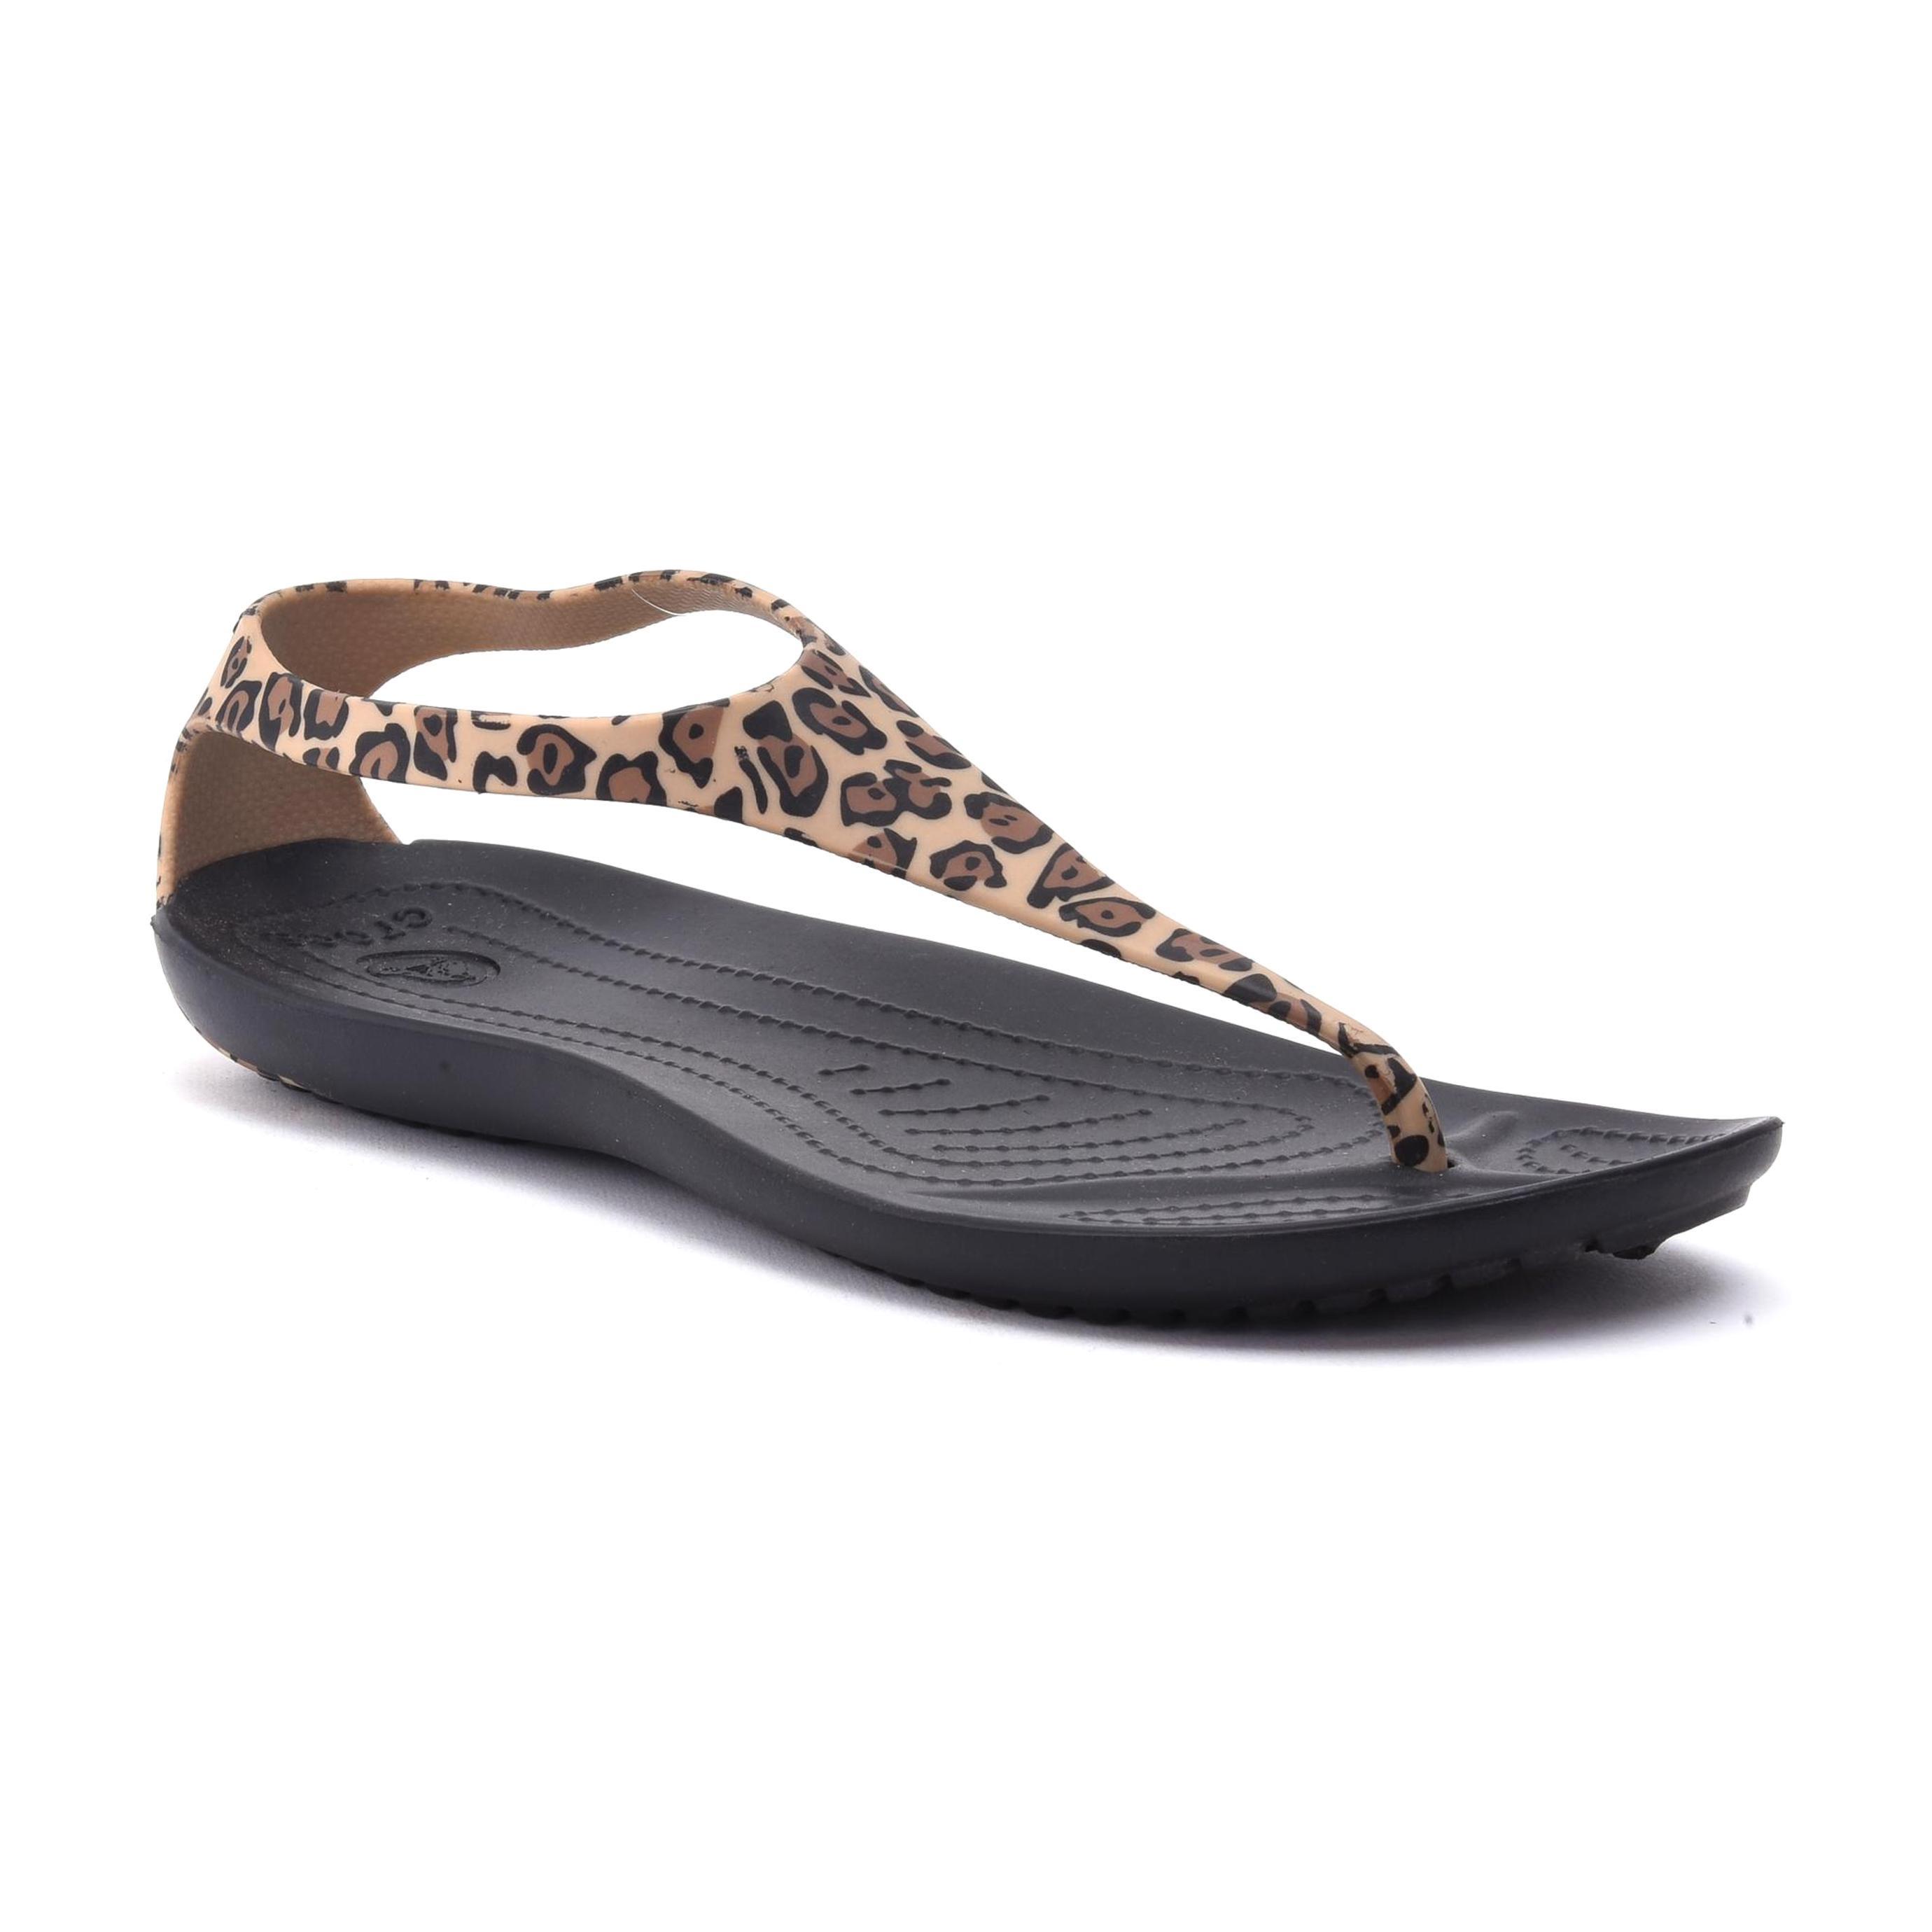 Crocs Sexi Wild Flip - סנדל אצבע לנשים בהדפס מנומר